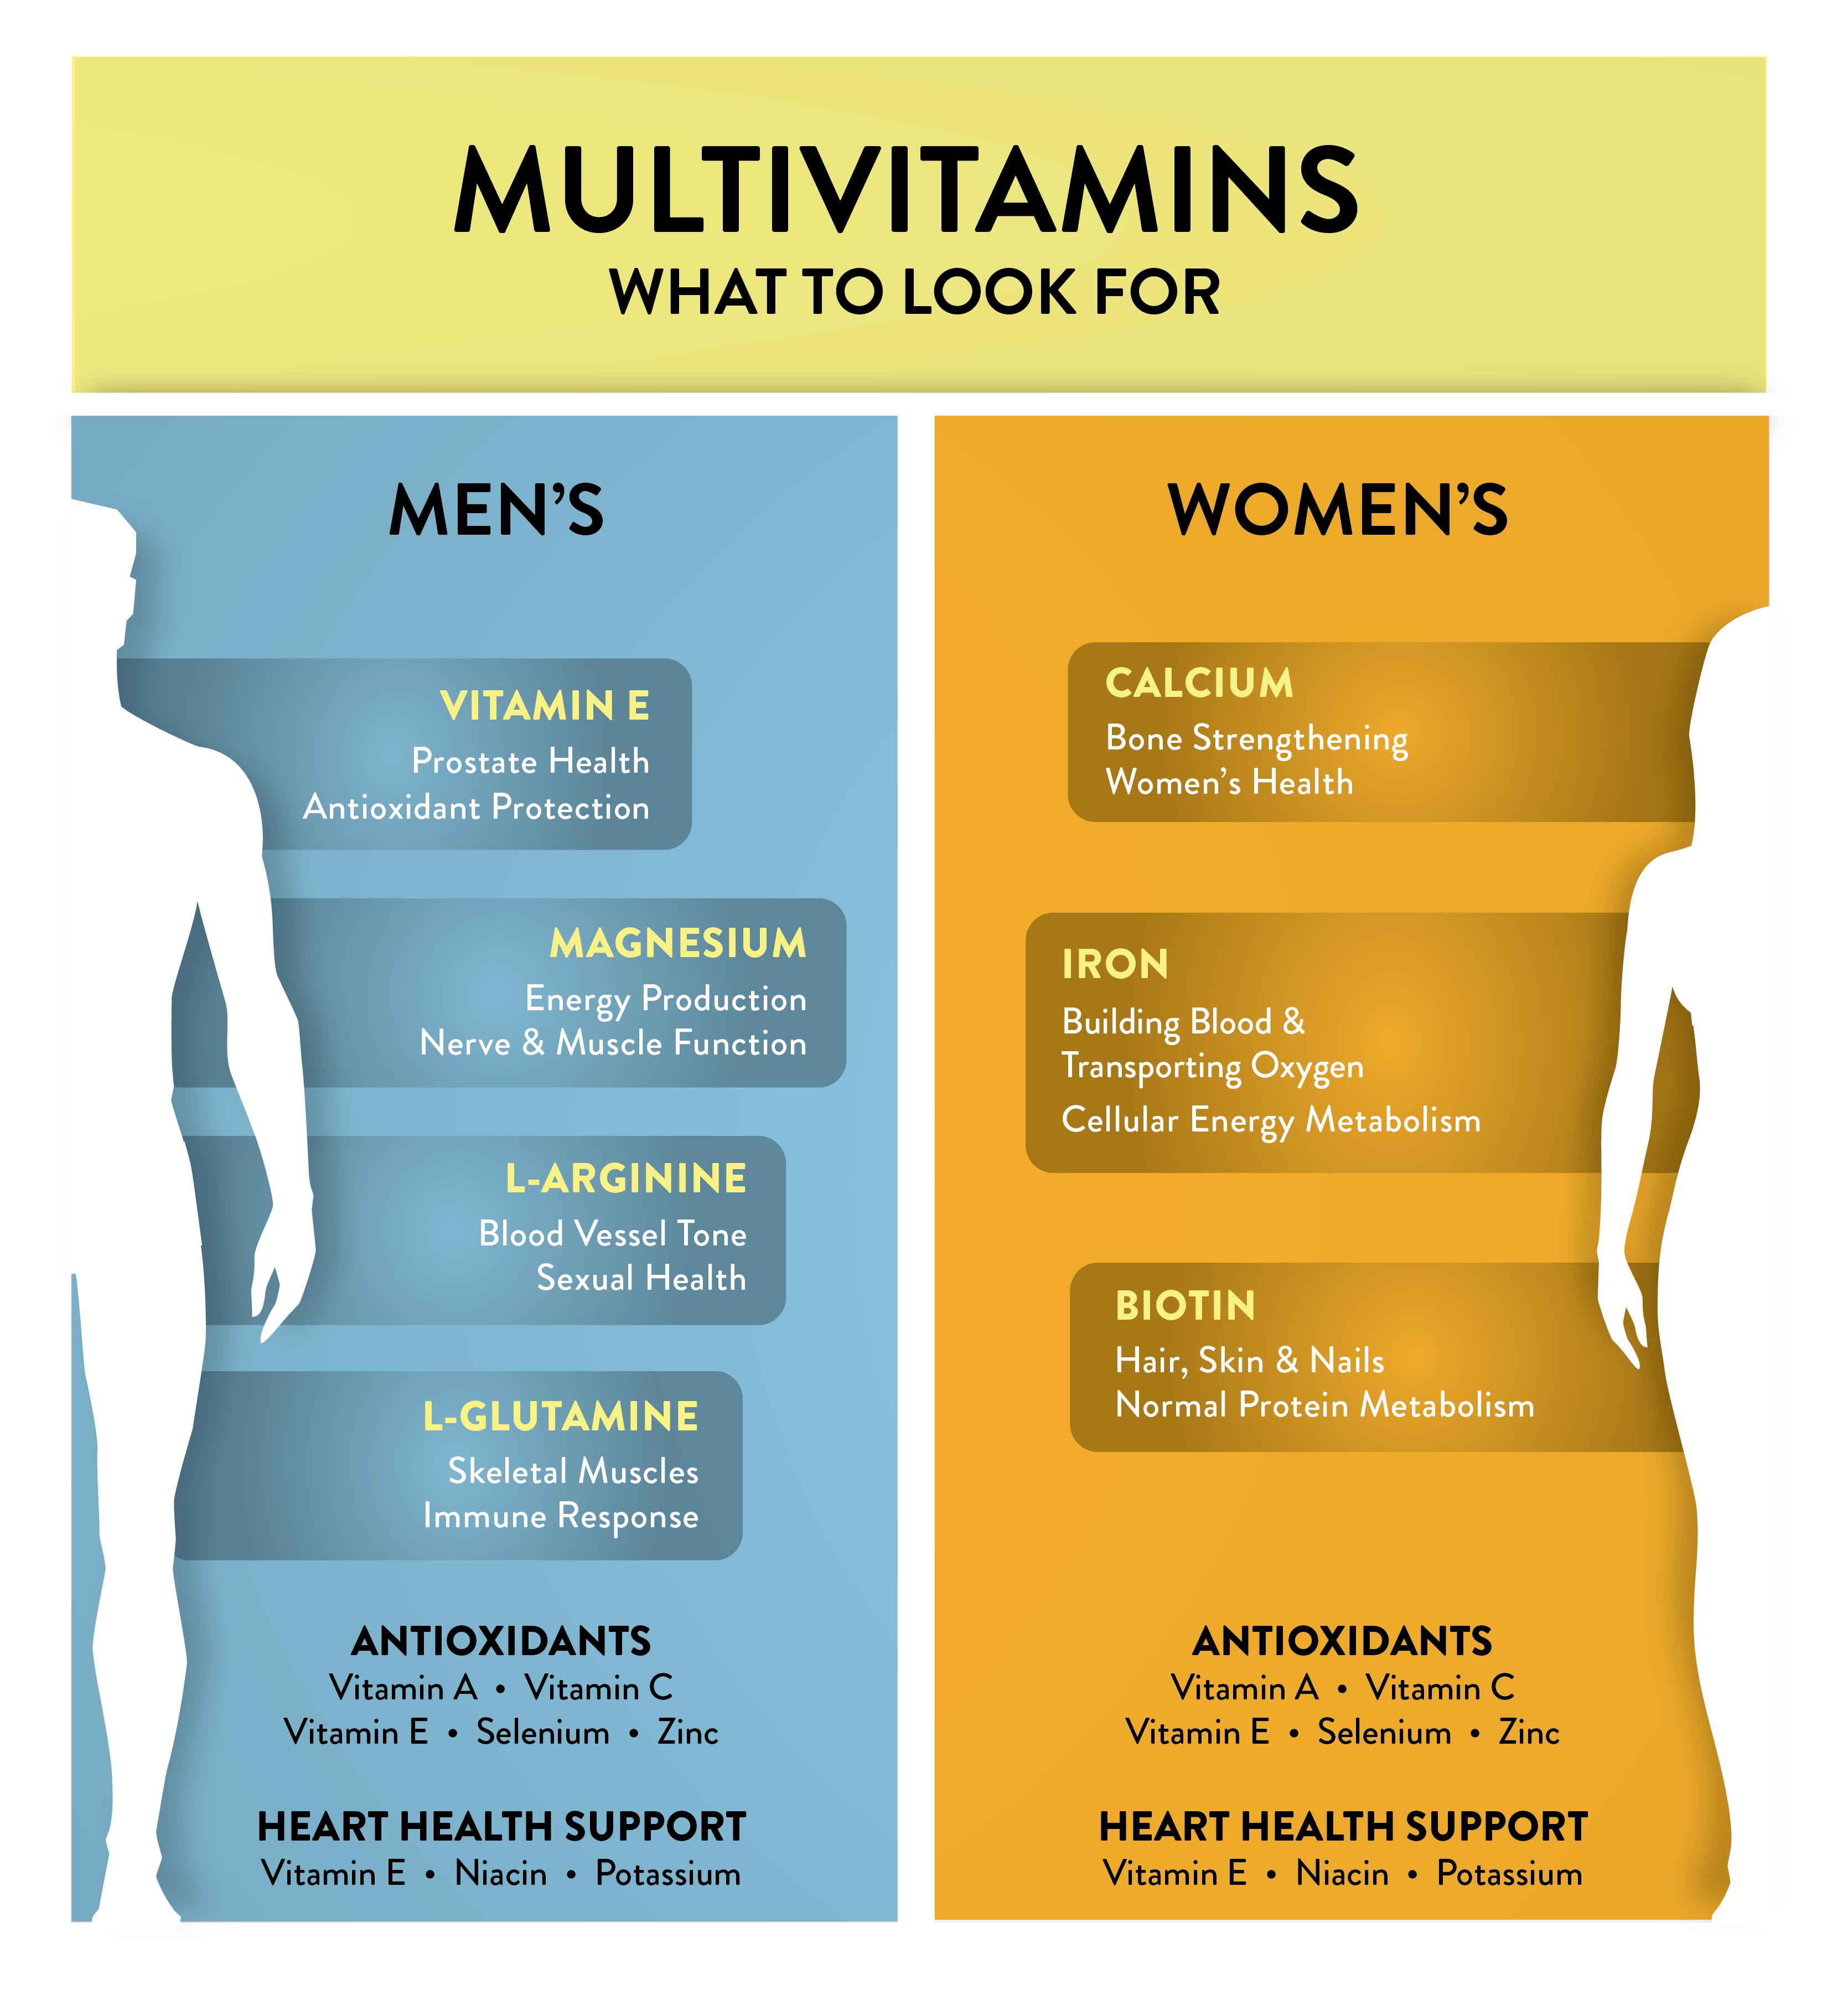 Comparison Chart showing Differences Between Men's vs. Women's Multivitamins